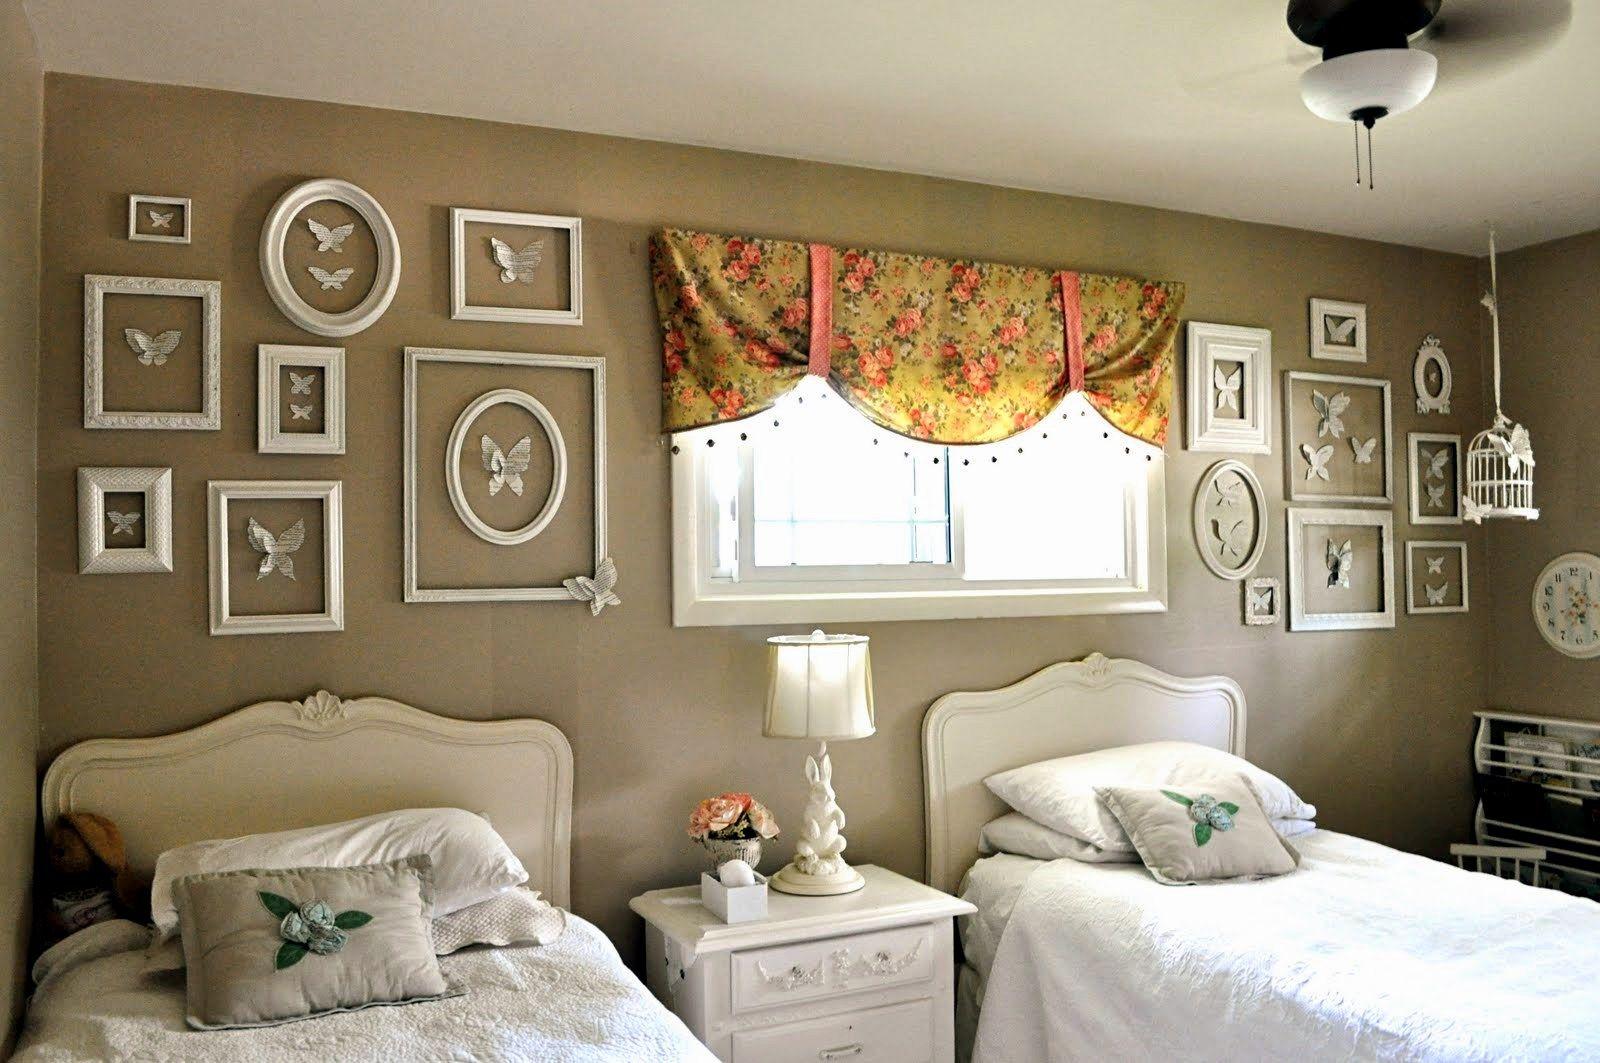 photo wall colored frames | via All Things Beautiful | decor ideas ...